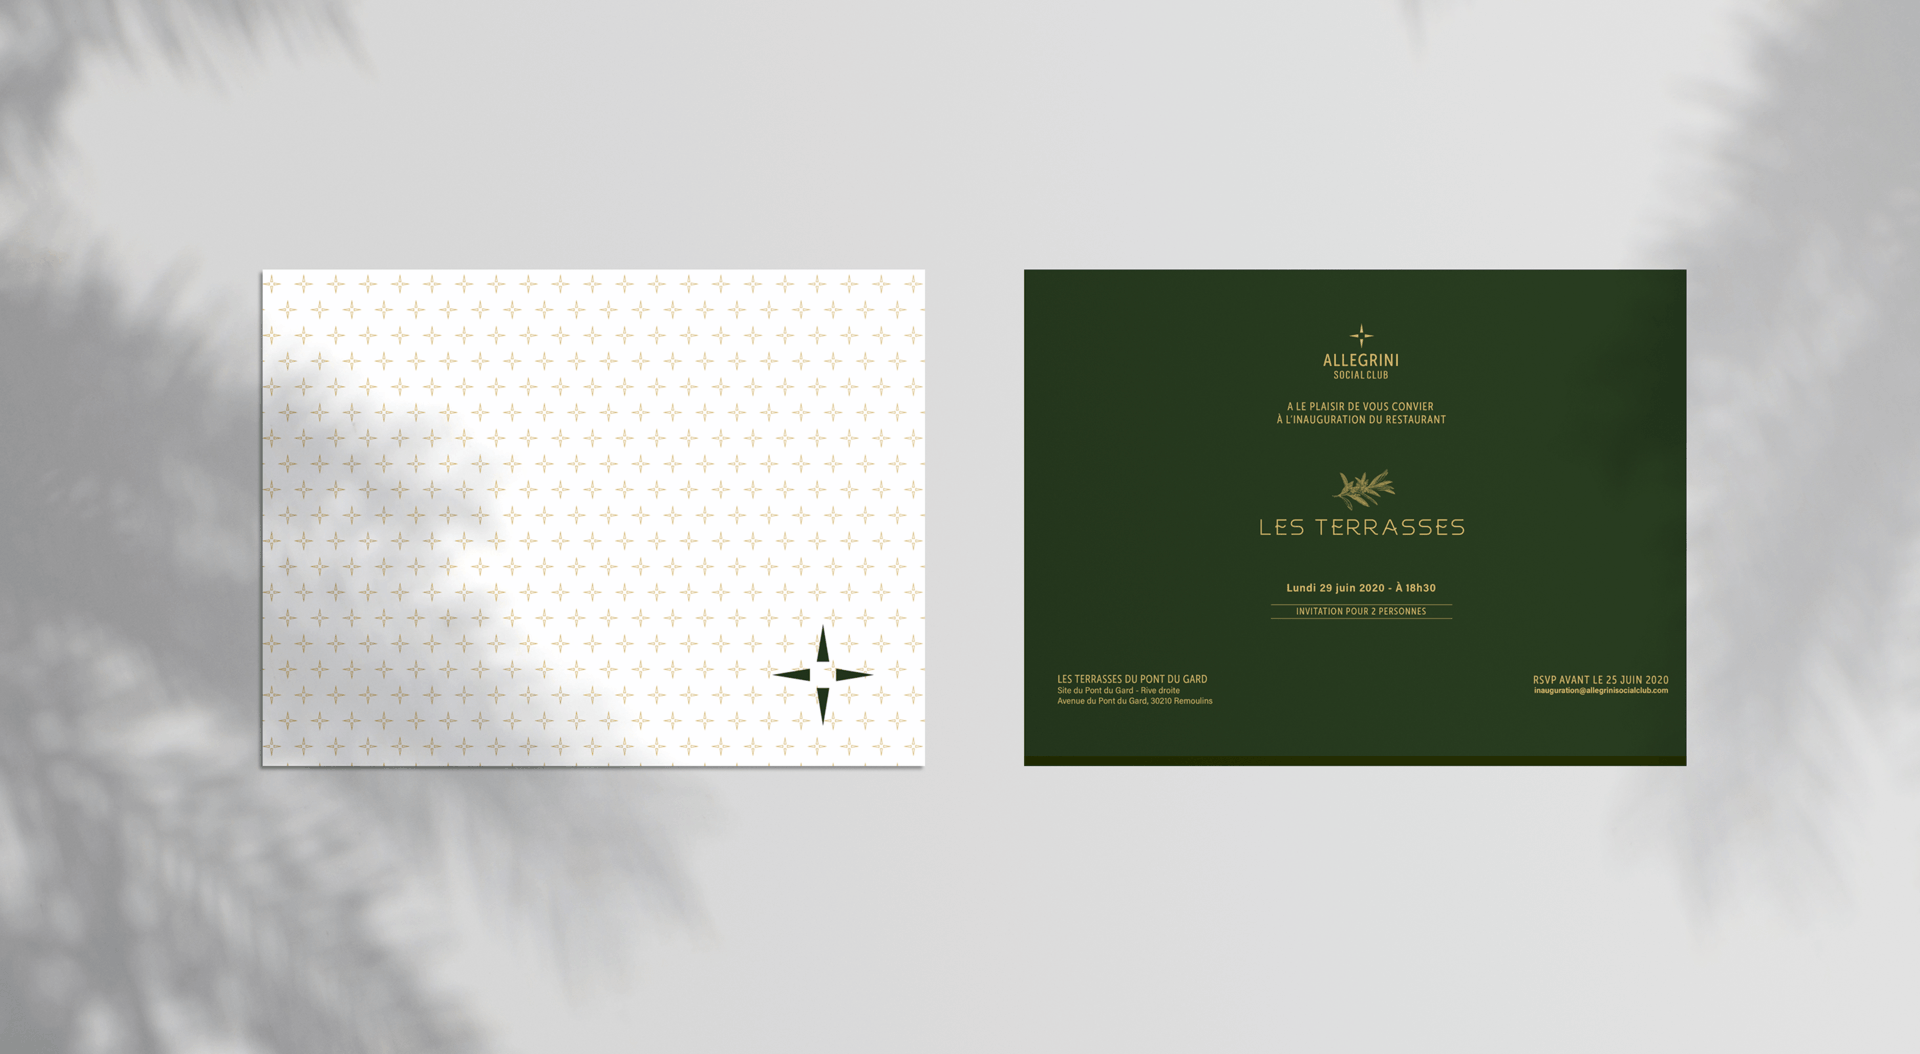 Allegrini_invitation